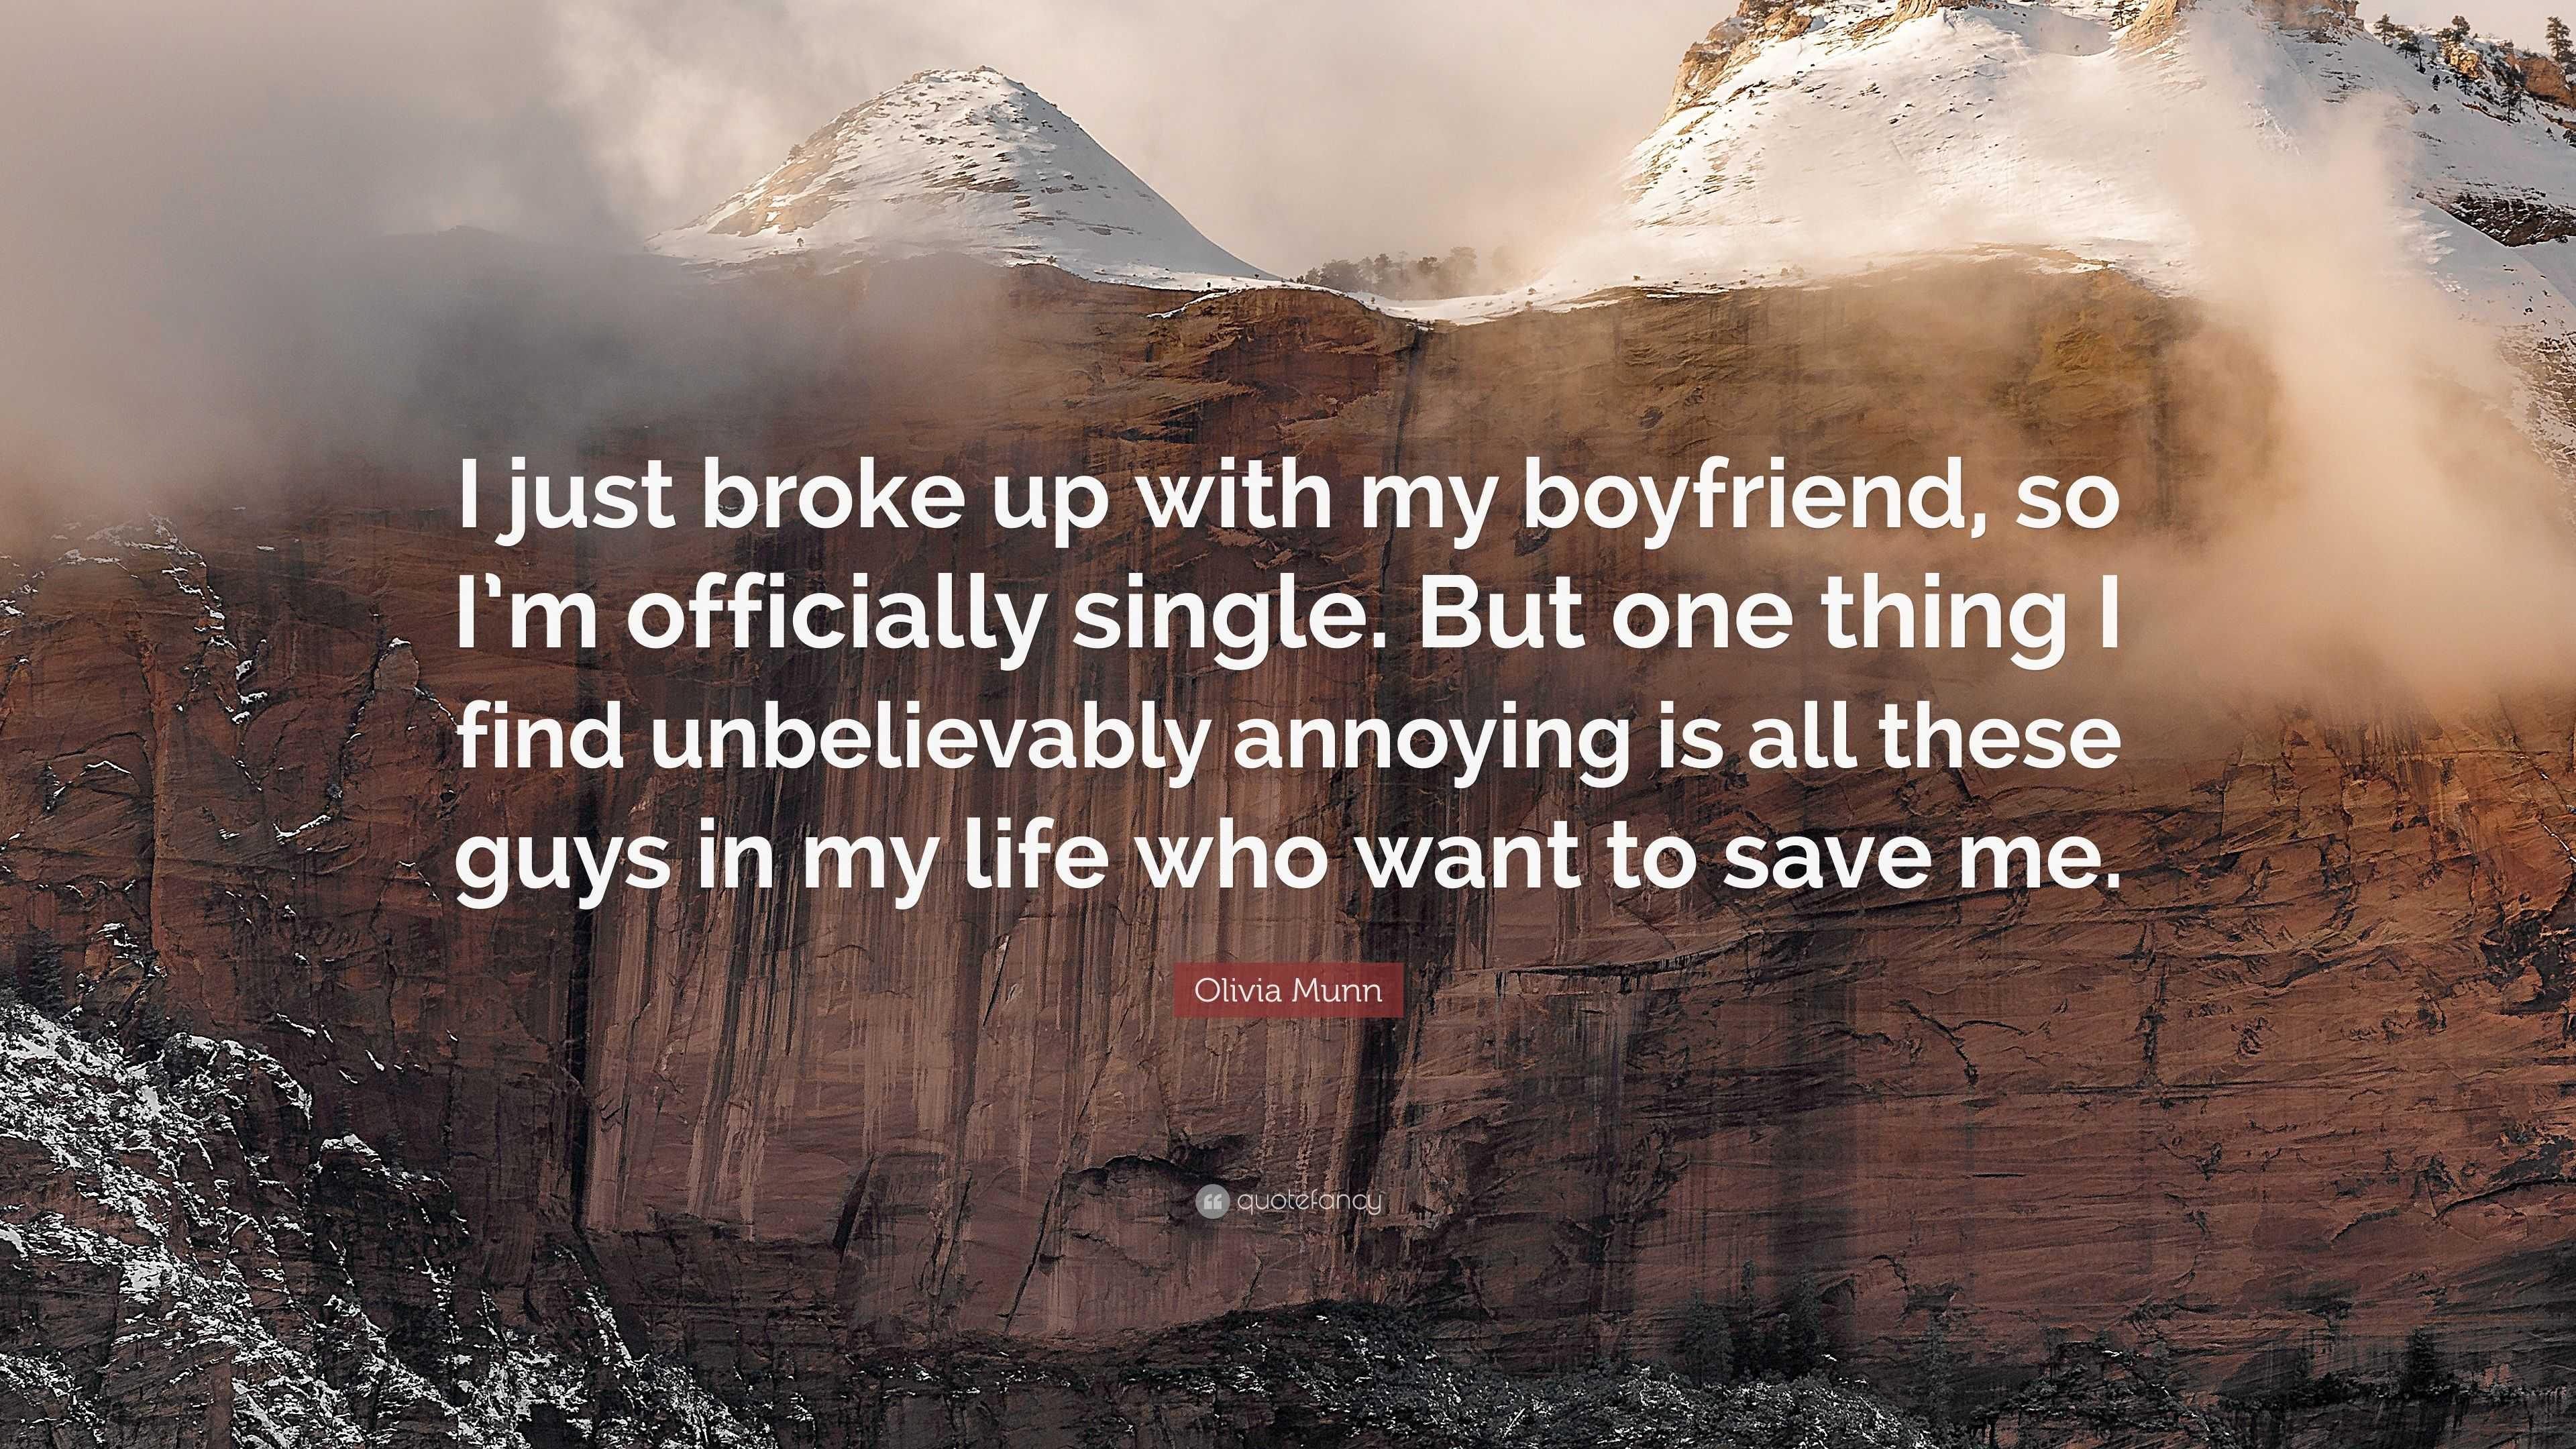 my boyfriend just broke up with me